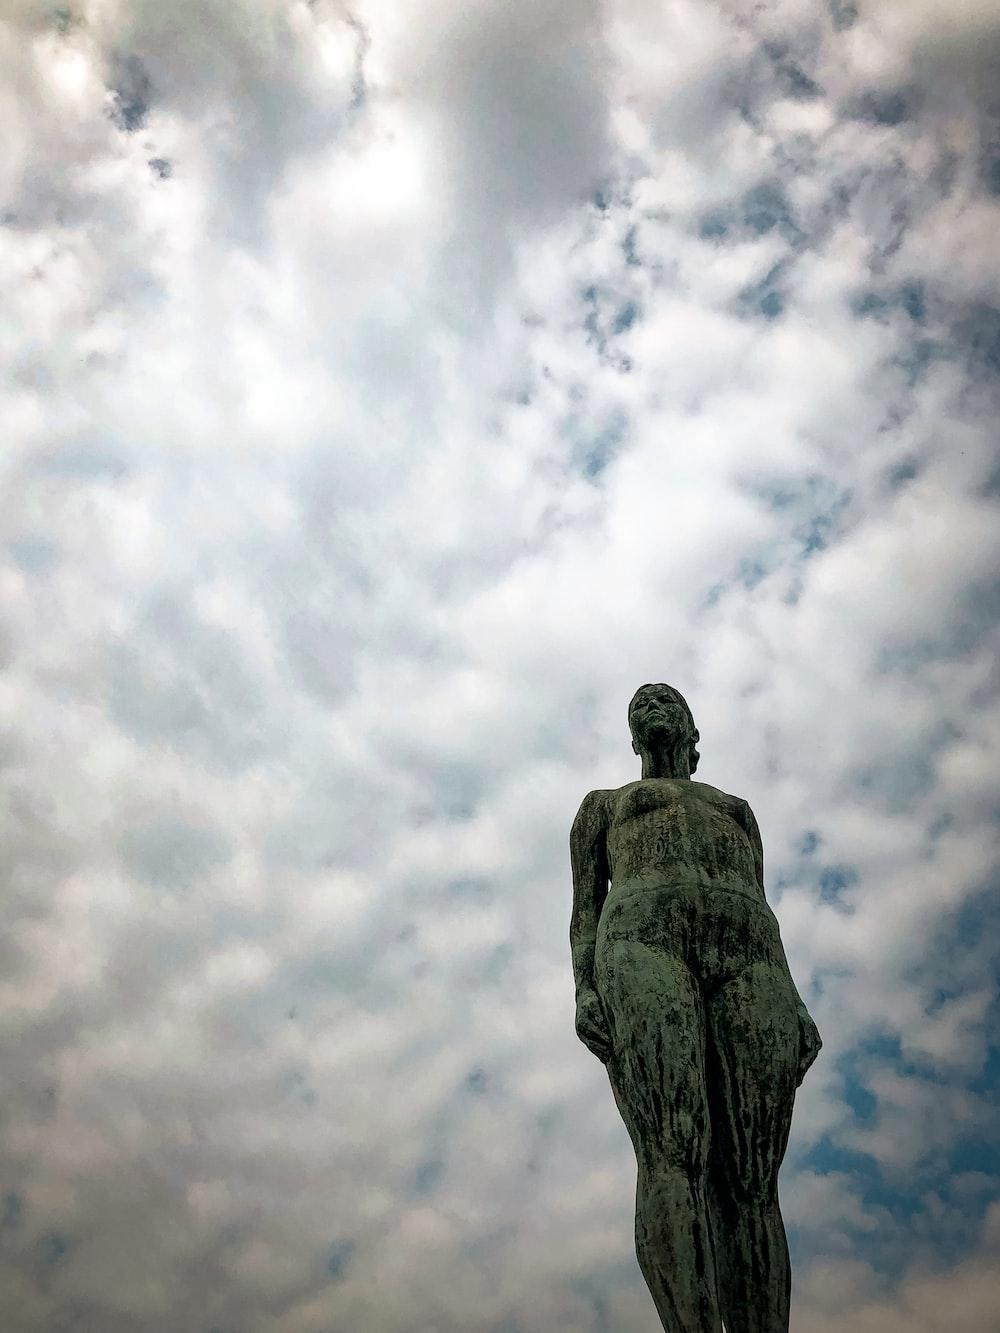 man statue under white clouds during daytime